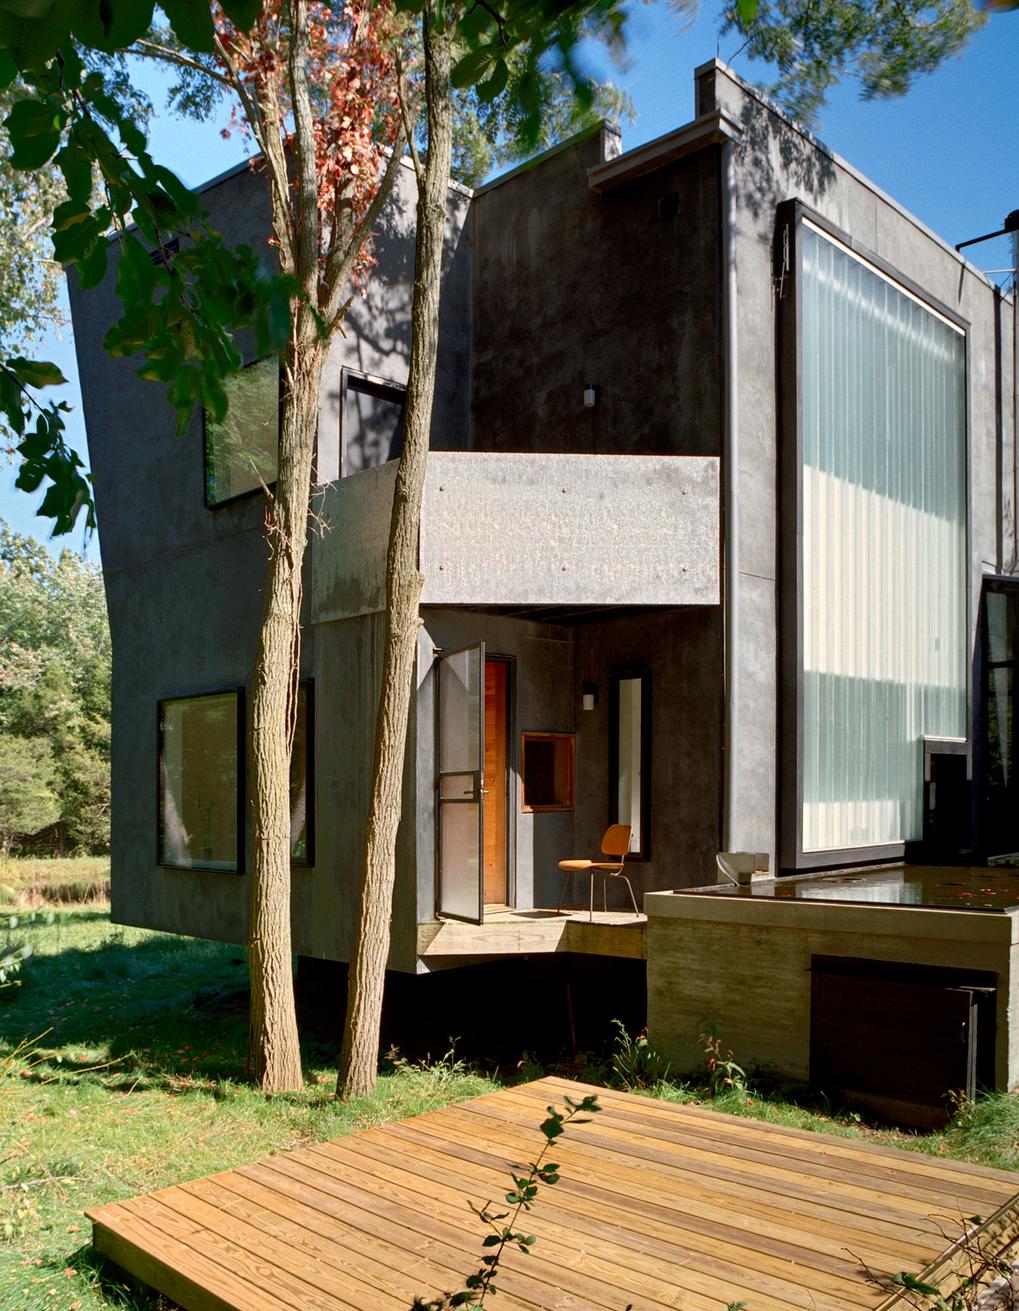 Home holl innenarchitektur tesseract house by steven holl architects photography by bilyana